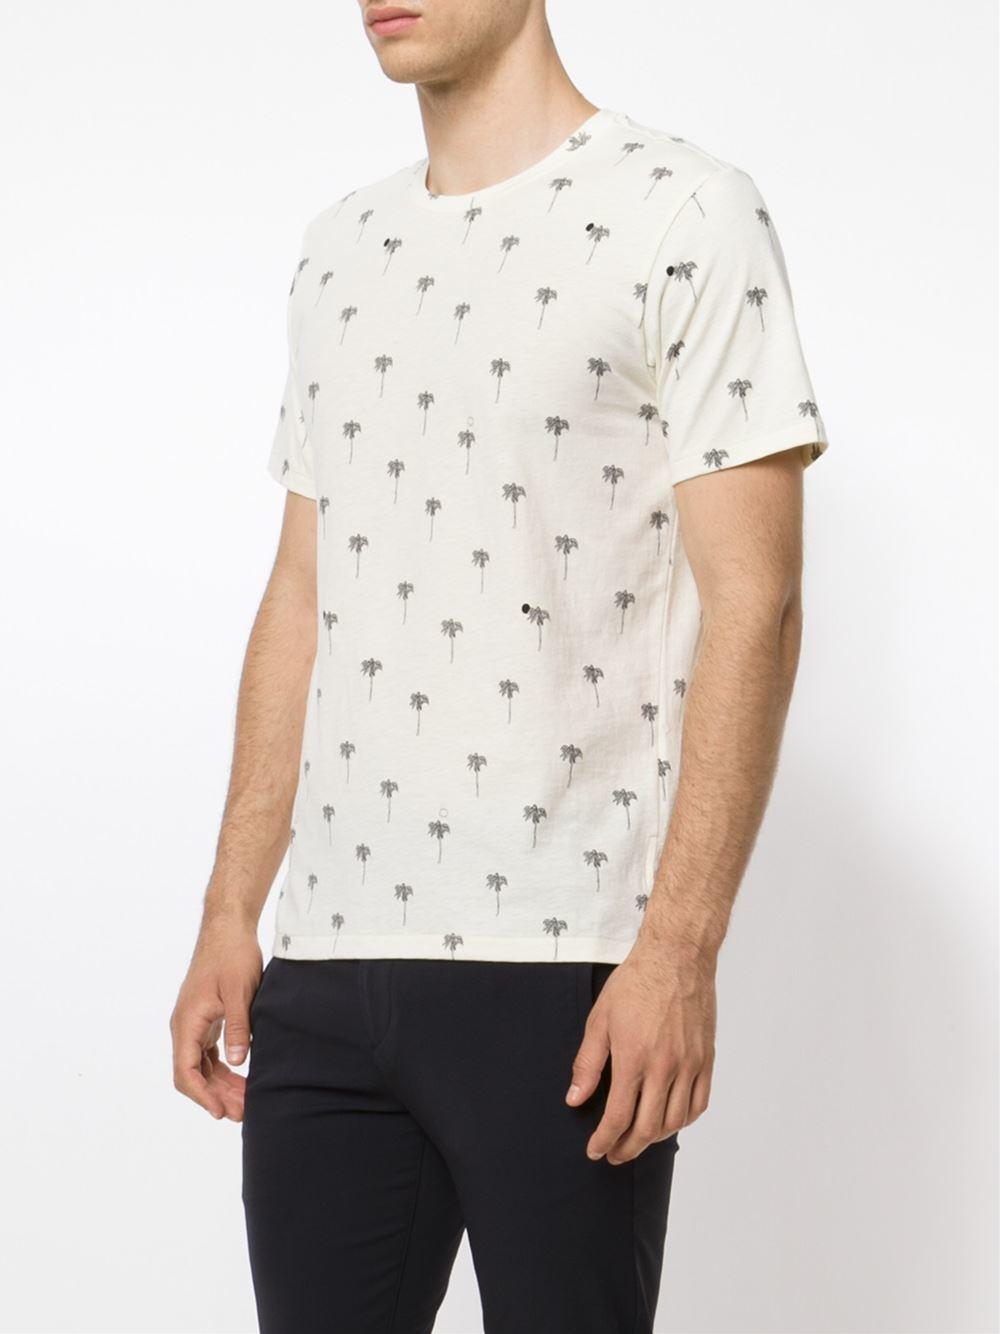 Rag bone palm tree print t shirt in white for men lyst for Rag and bone t shirts